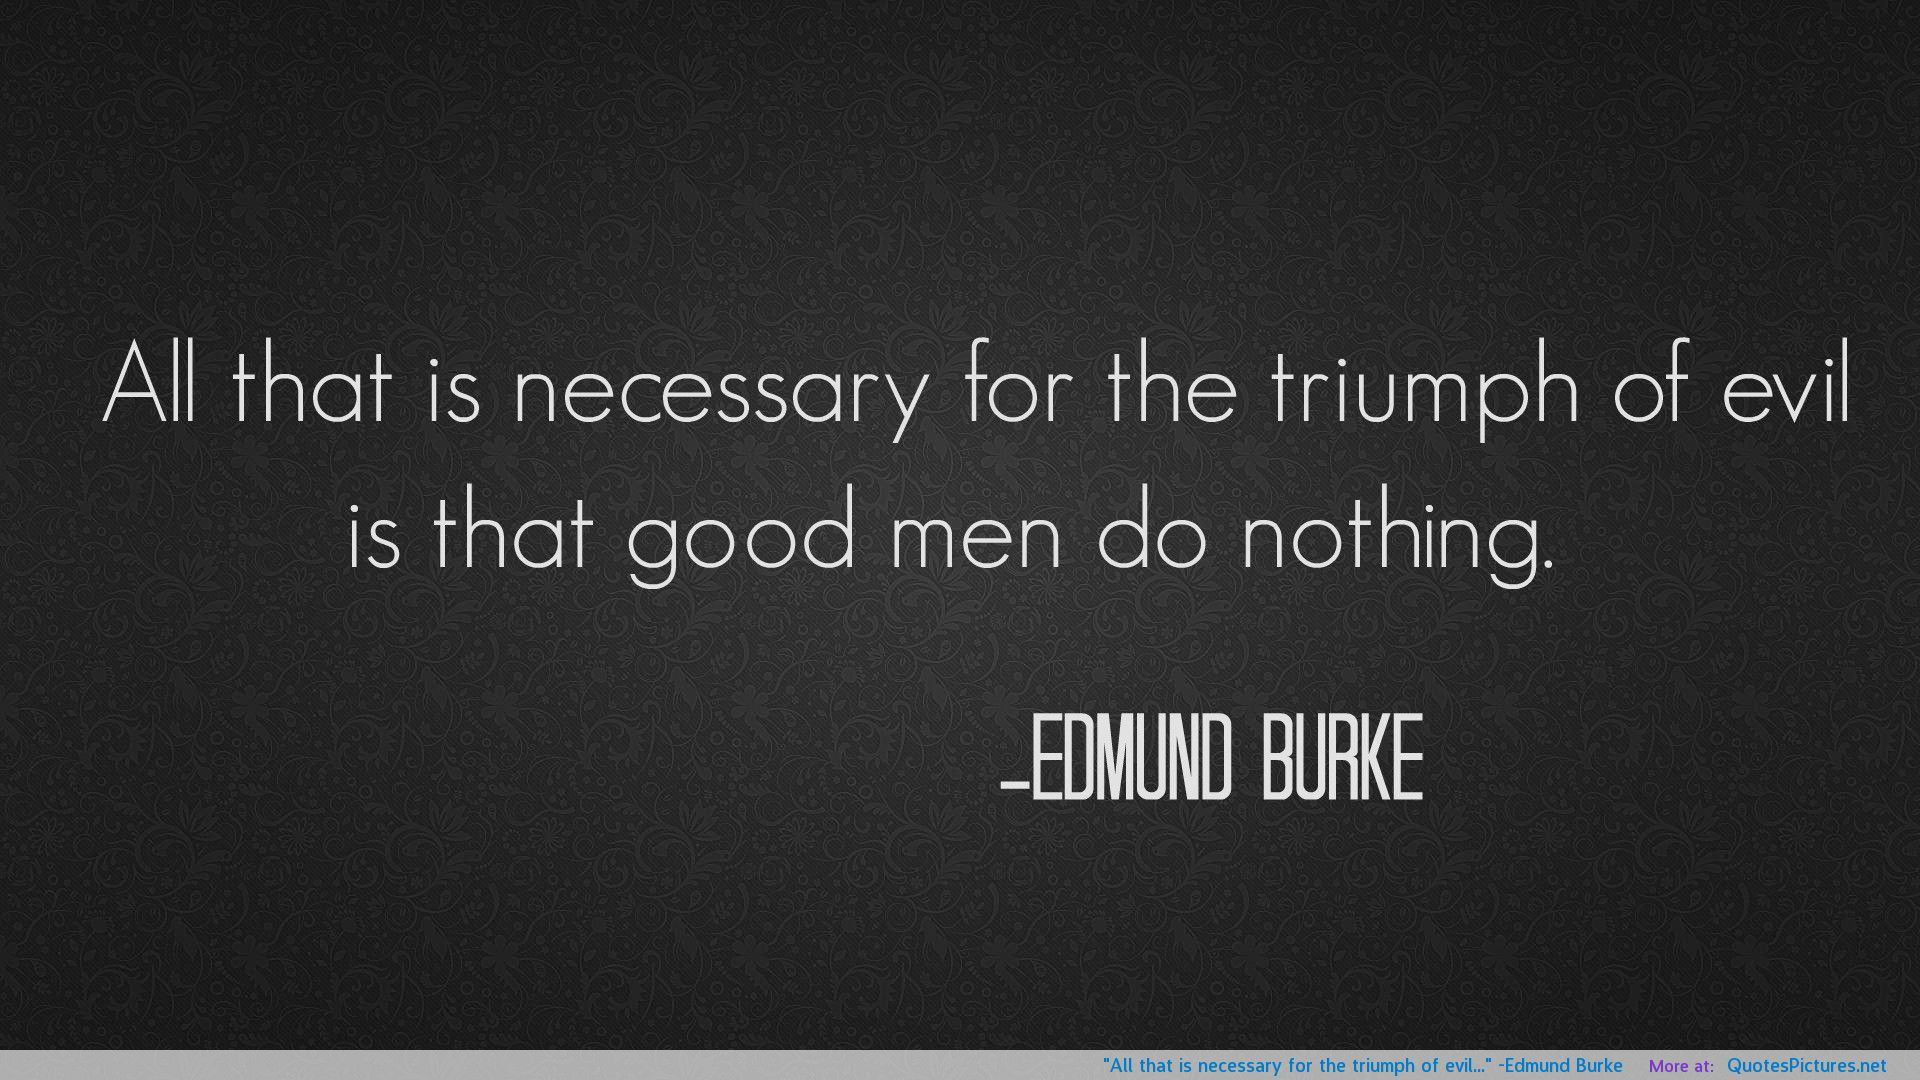 Edmund Burke said: